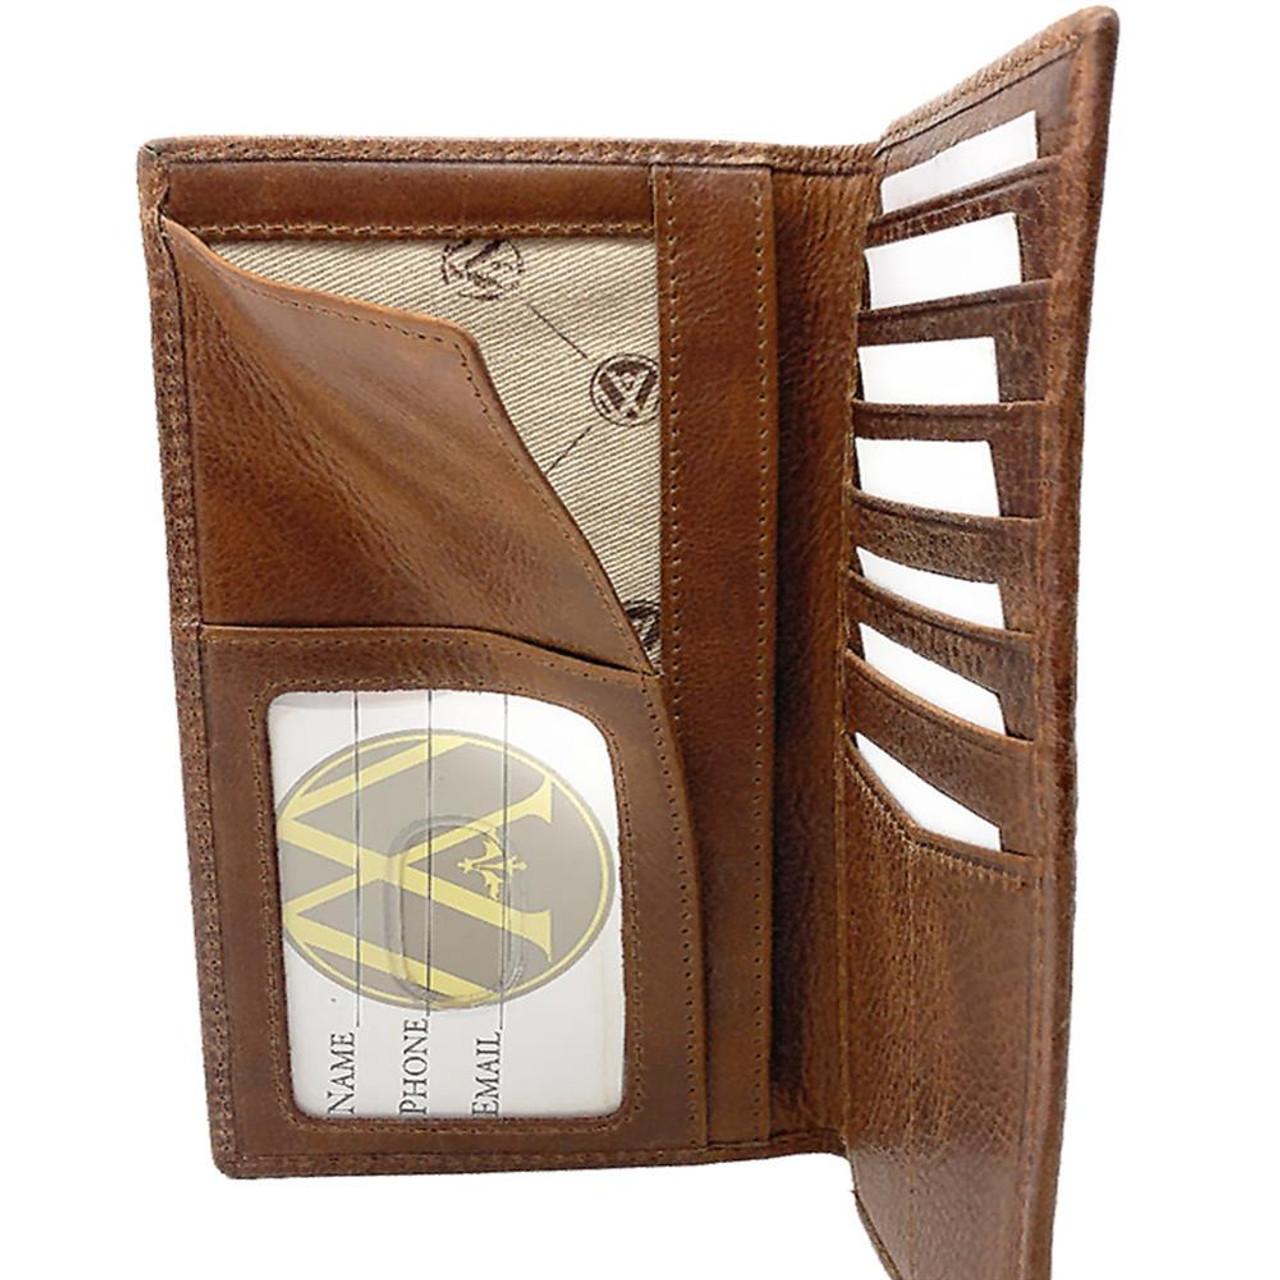 Men's NCSU NC State Wolfpack Leather Secretary Pocket Wallet